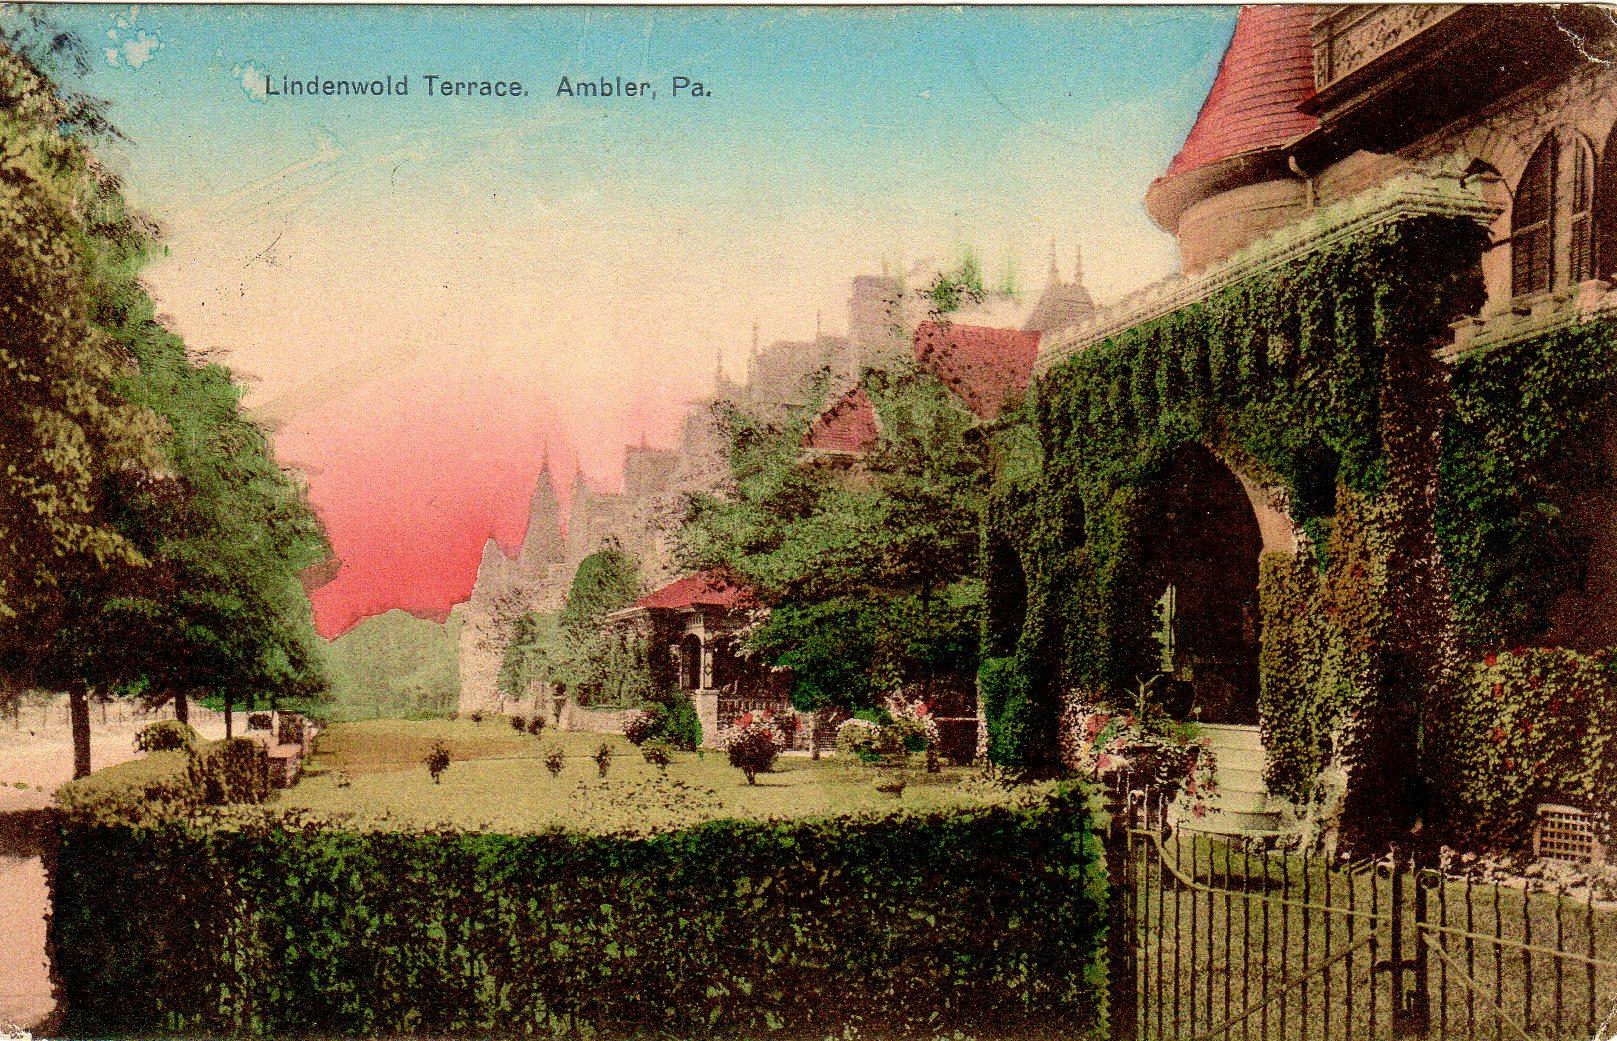 Post Card Collection (E Simon)_2682_33_Lindenwold Terrace, Ambler, Pa_17 Jul 1090